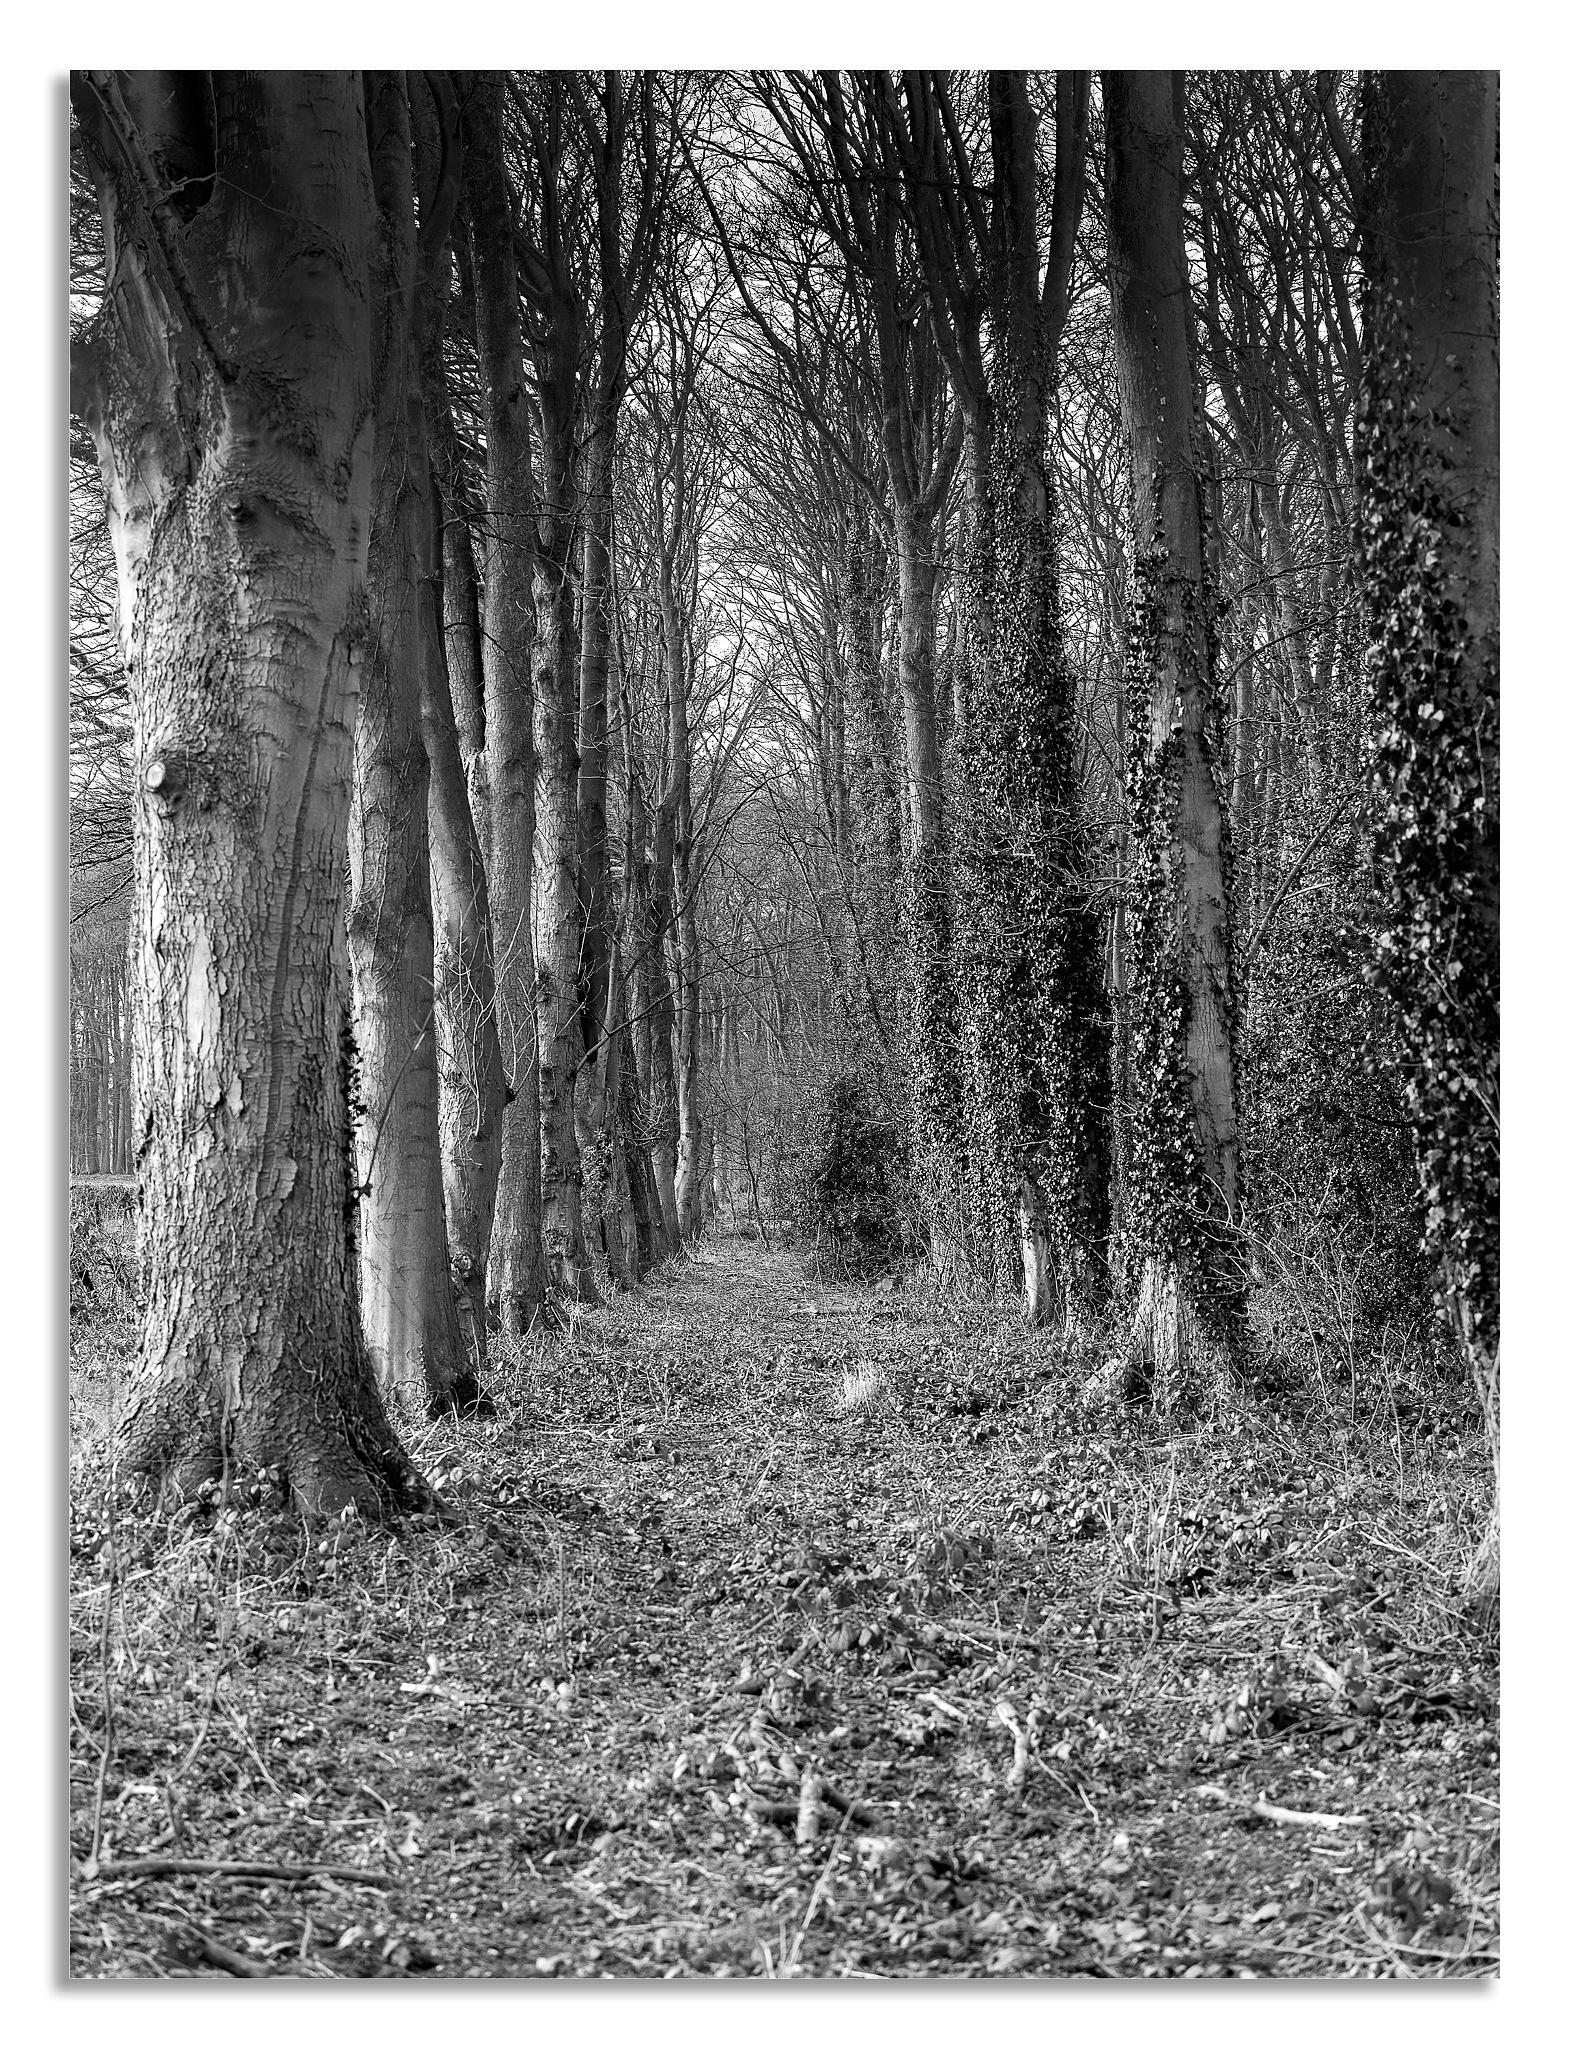 North Yorkshire Village walk 4 by johnhjic